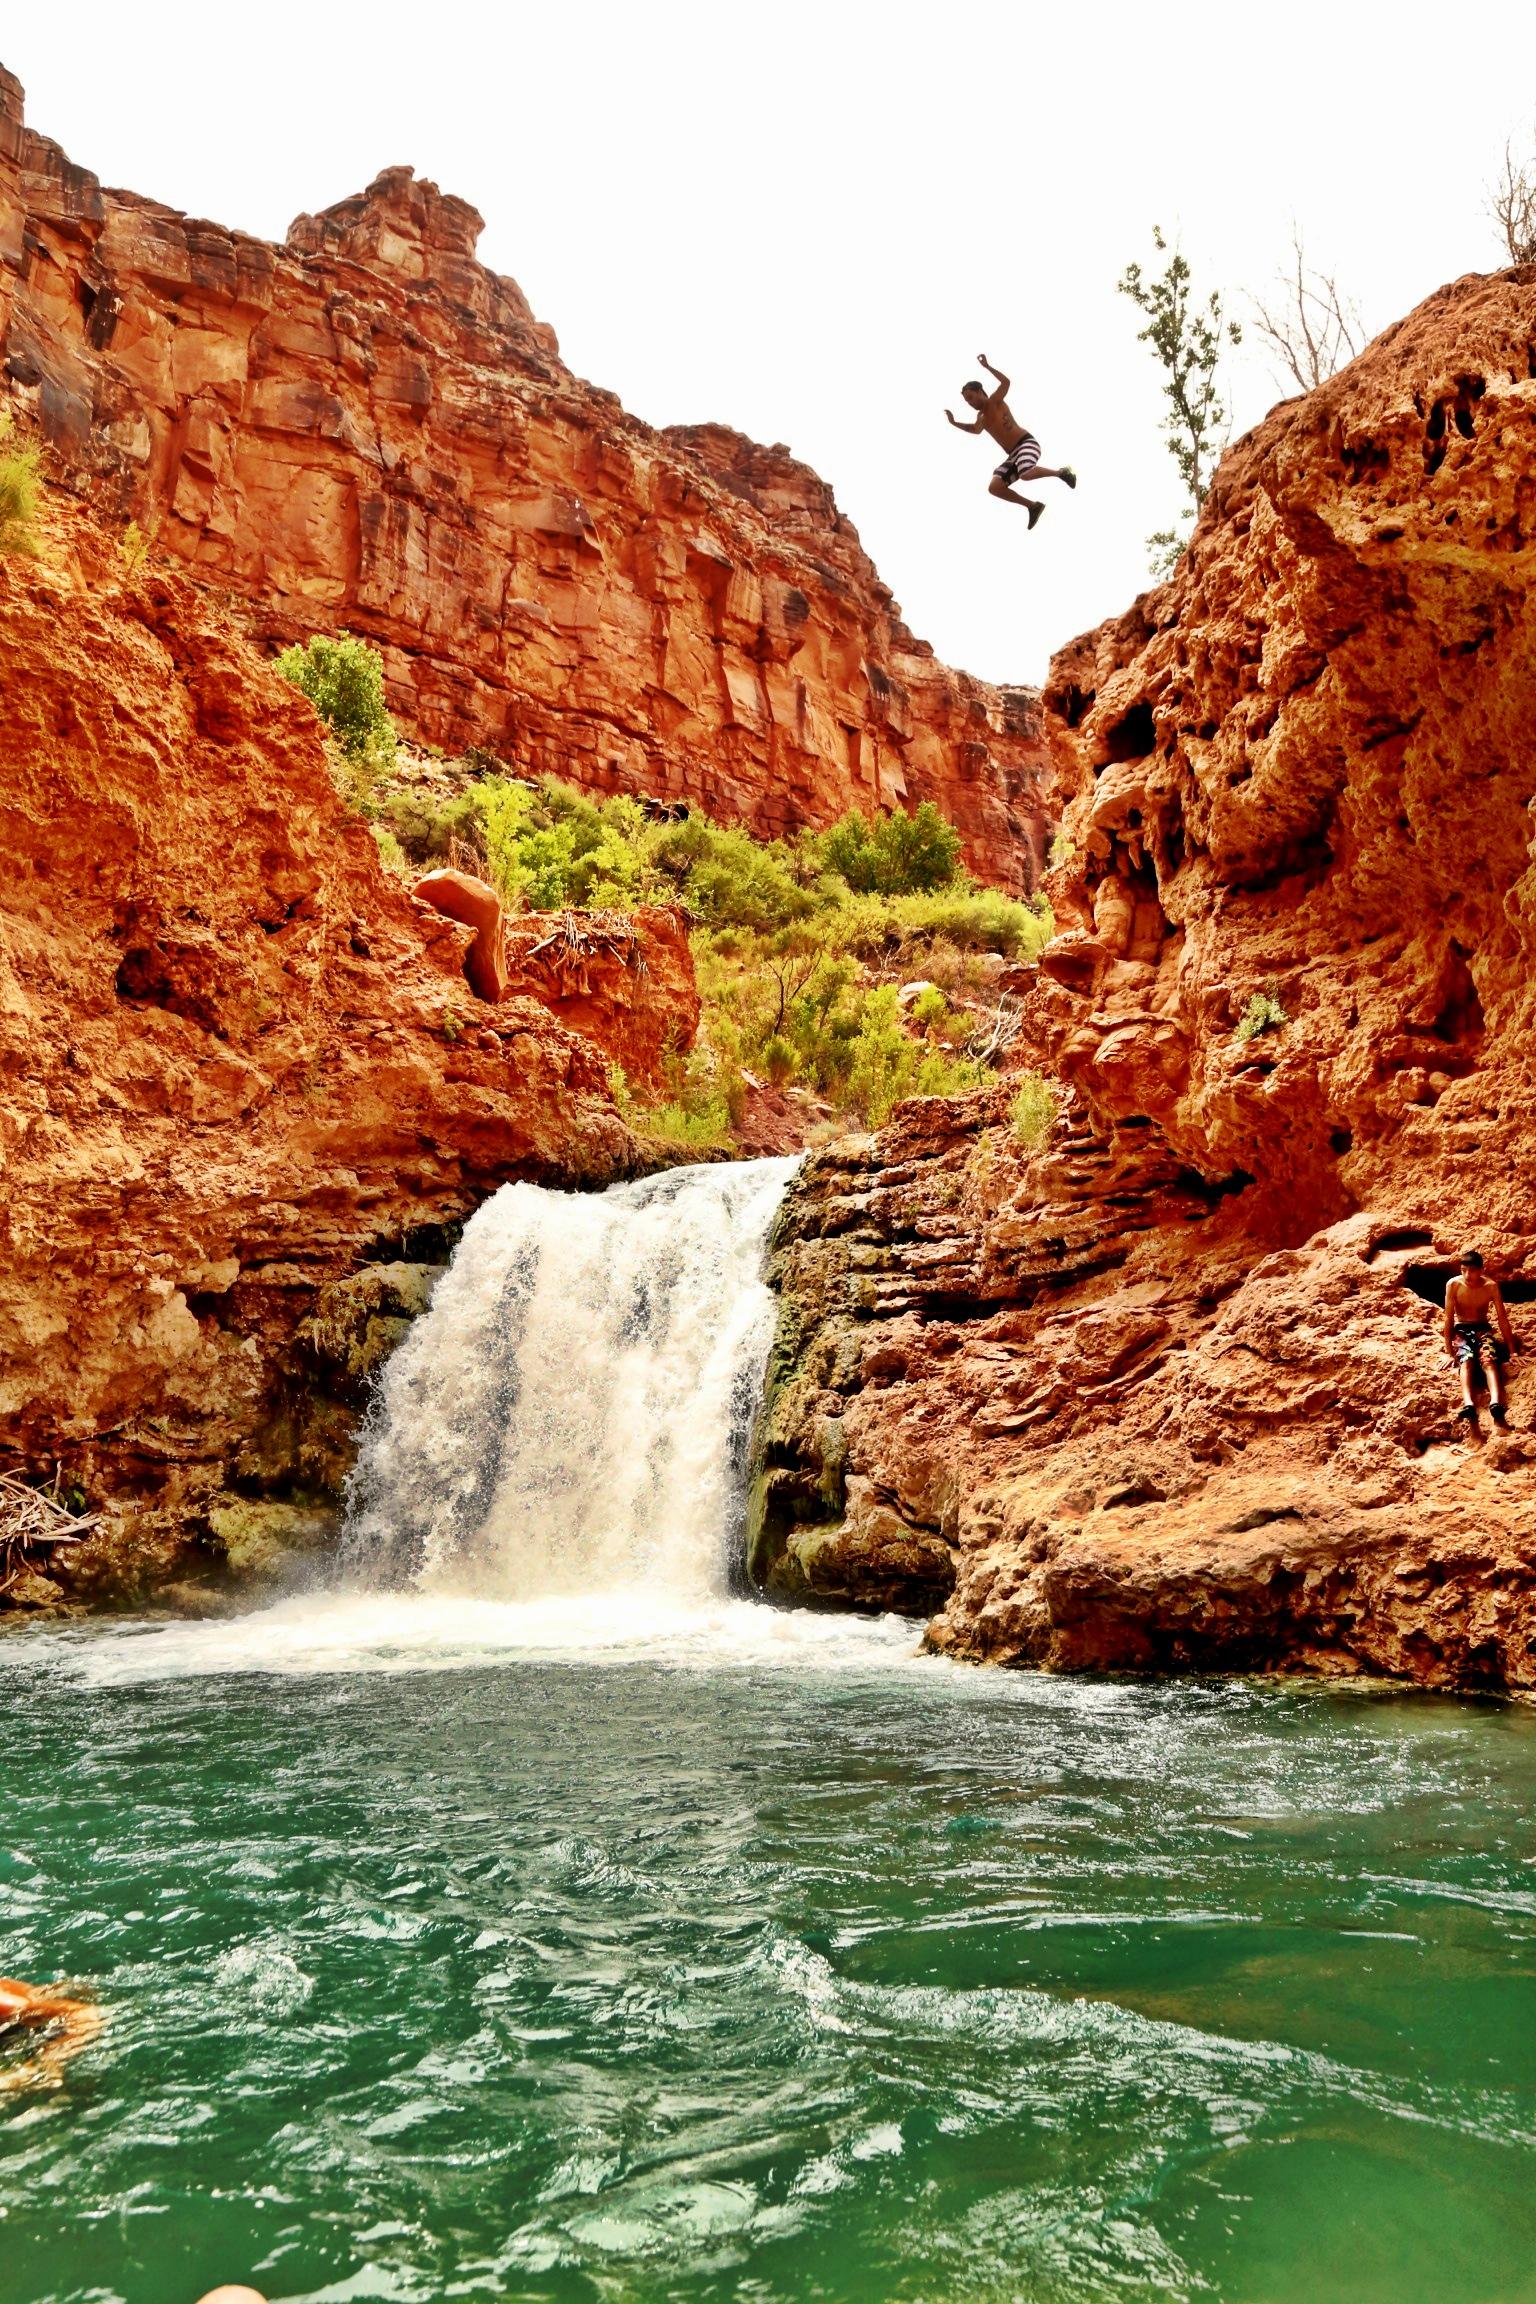 Jumping platform wikipedia - Highest cliff dive ...